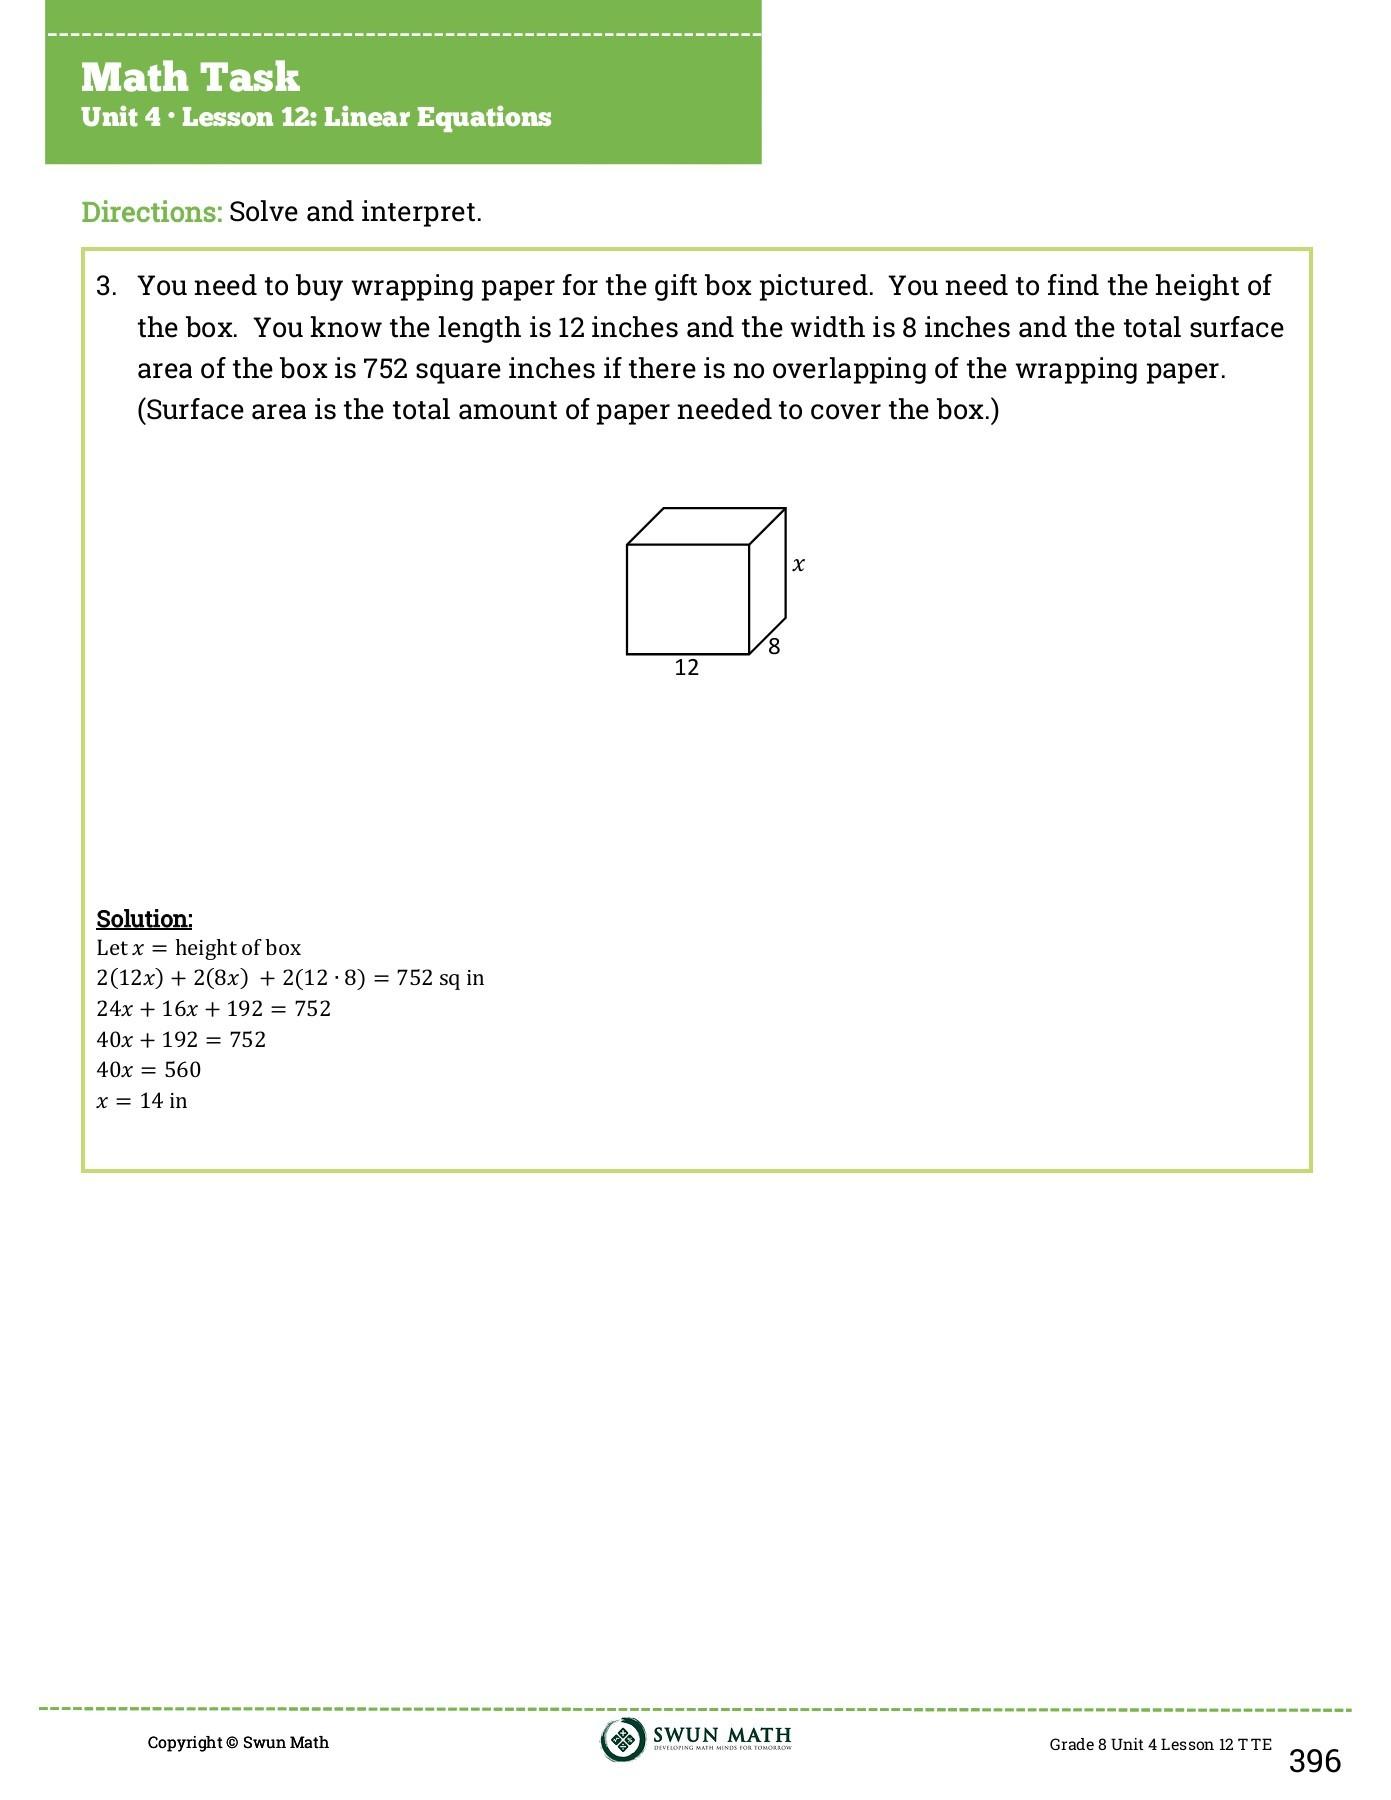 medium resolution of https://dubaikhalifas.com/8th-grade-math-equations-tessshebaylo/